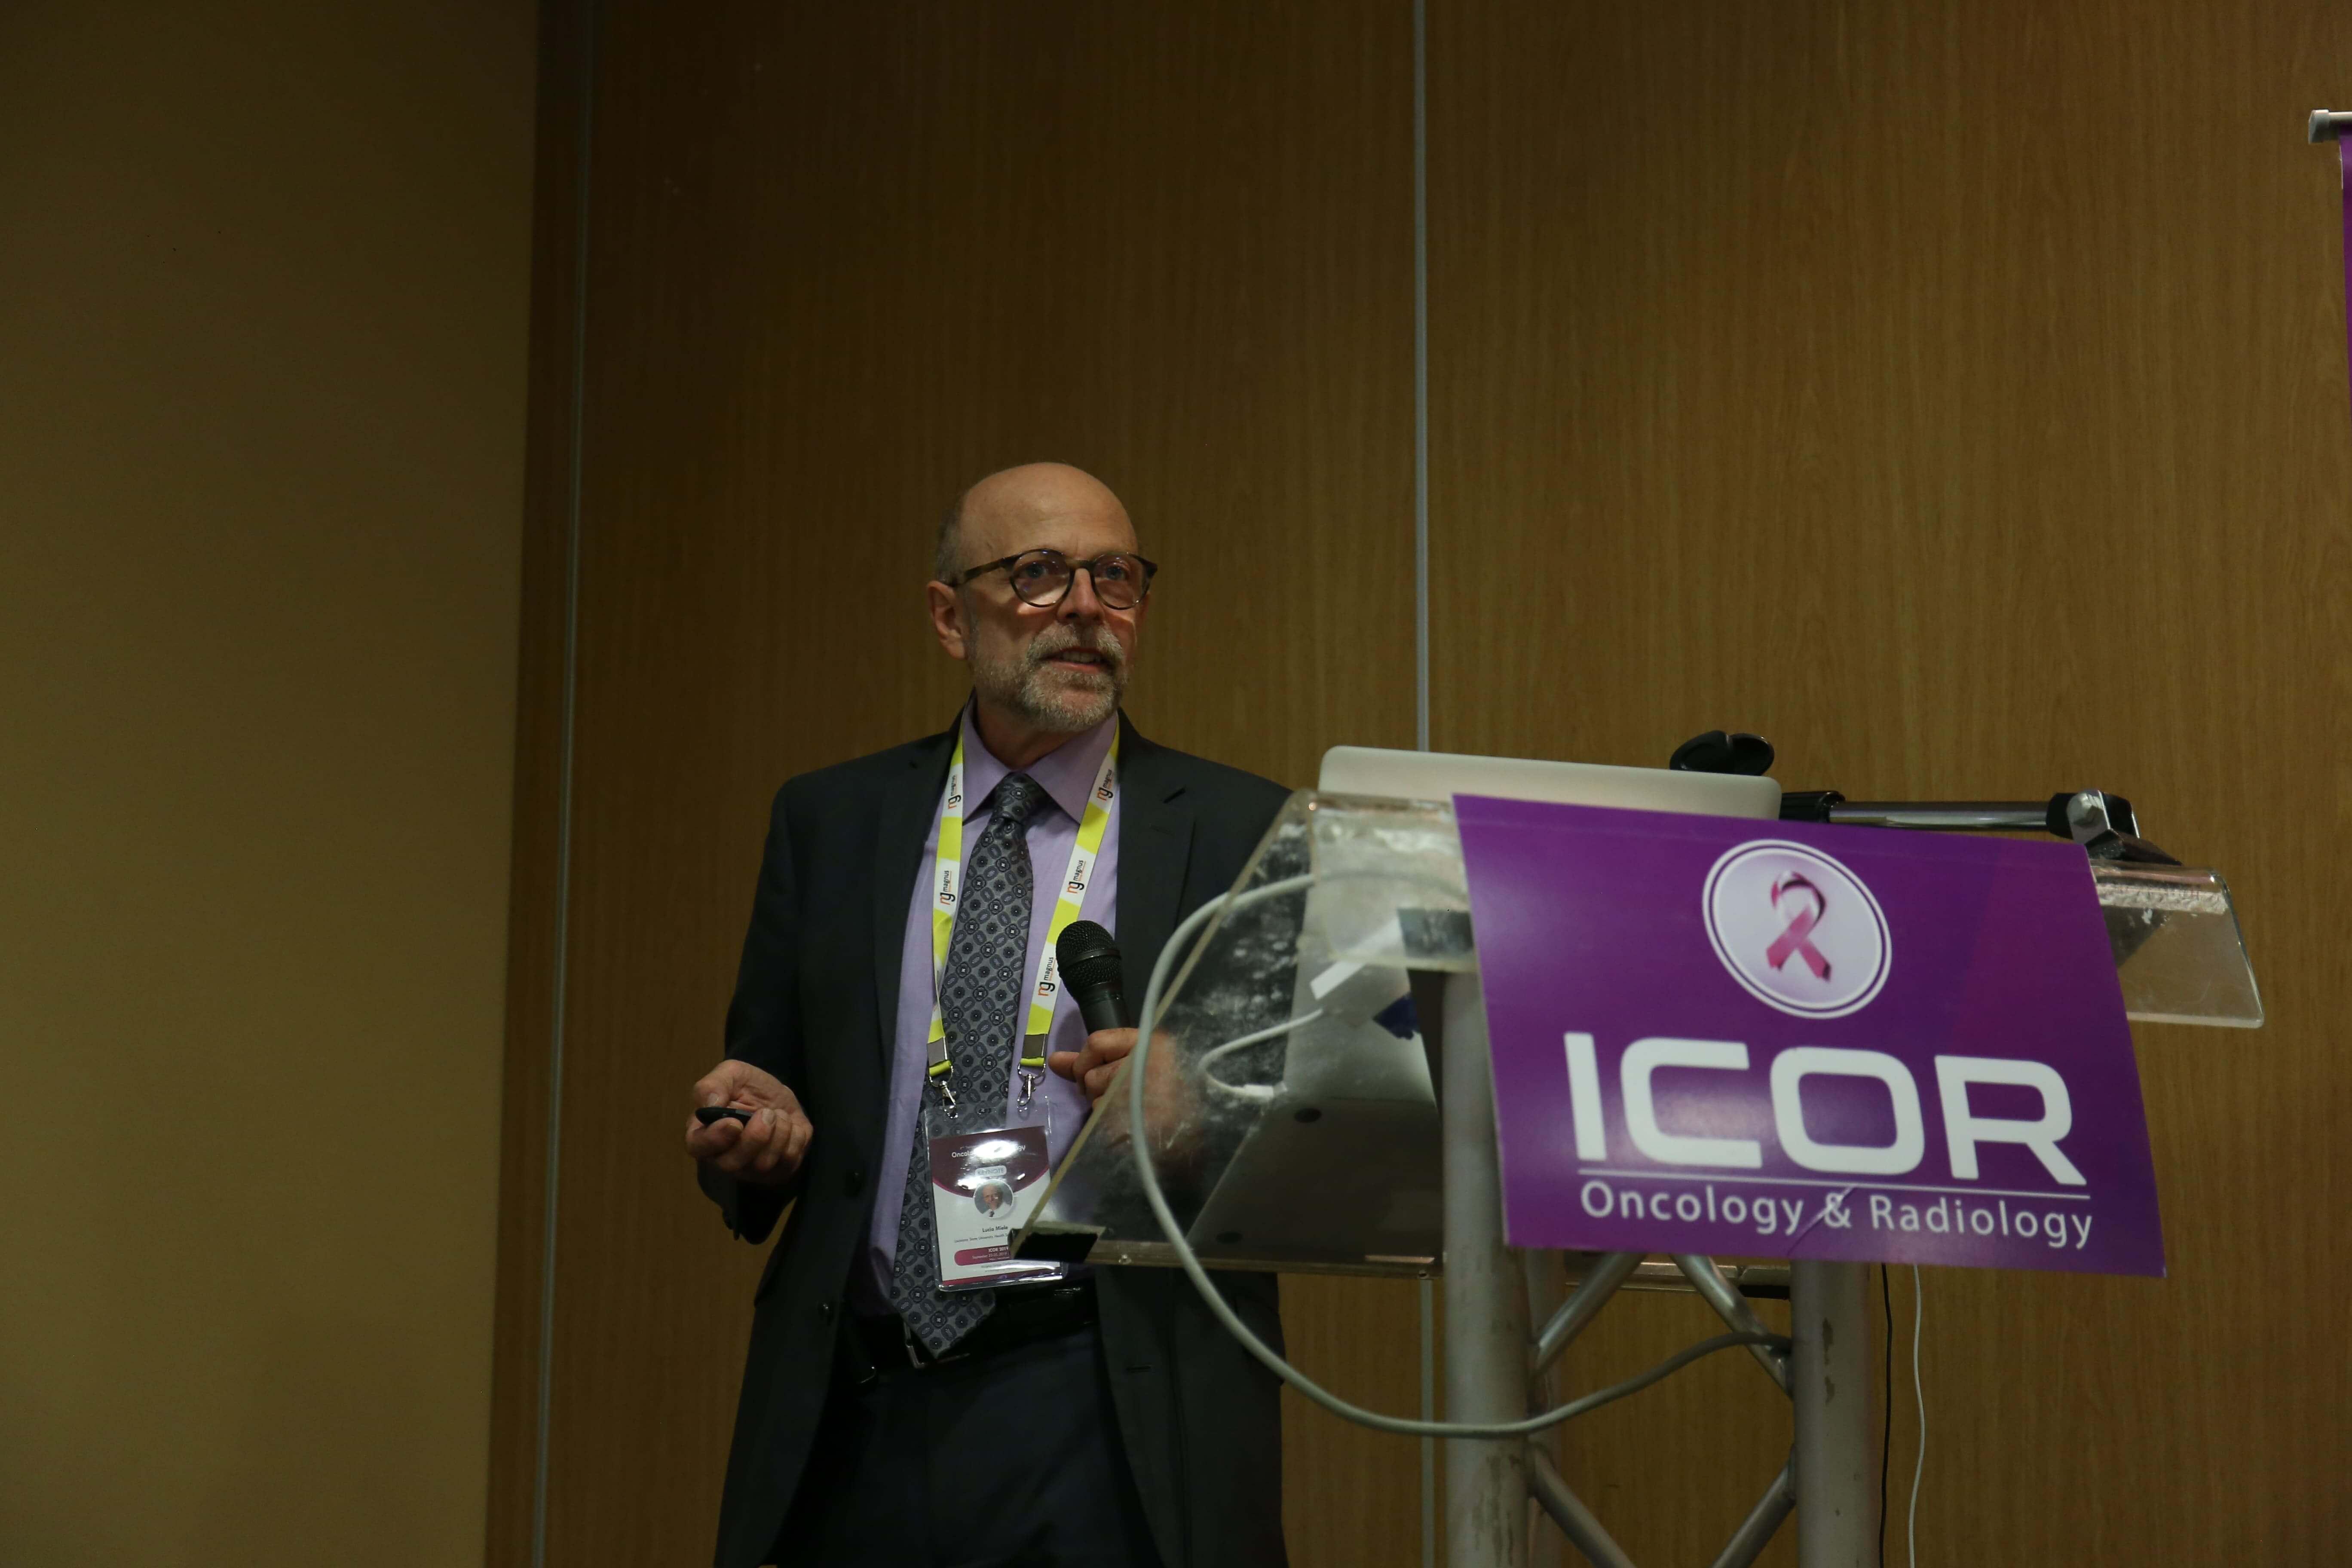 Cancer research conferences - Lucio Miele